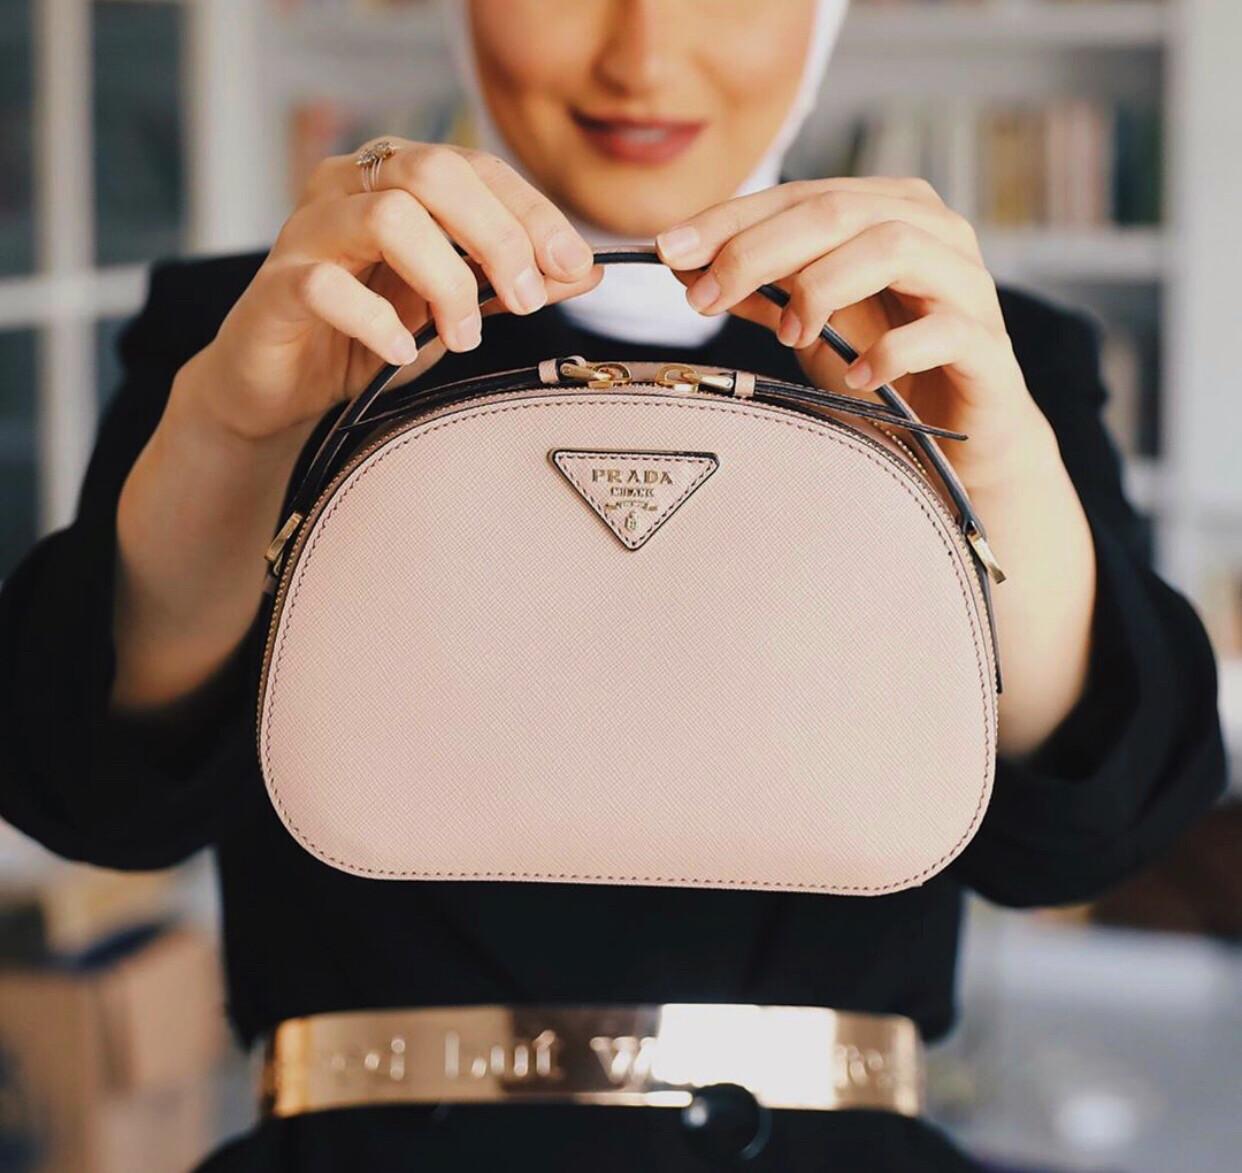 IN STOCK 1:1 Prada Odette Saffiano Leather Crossbody  bag - Nude